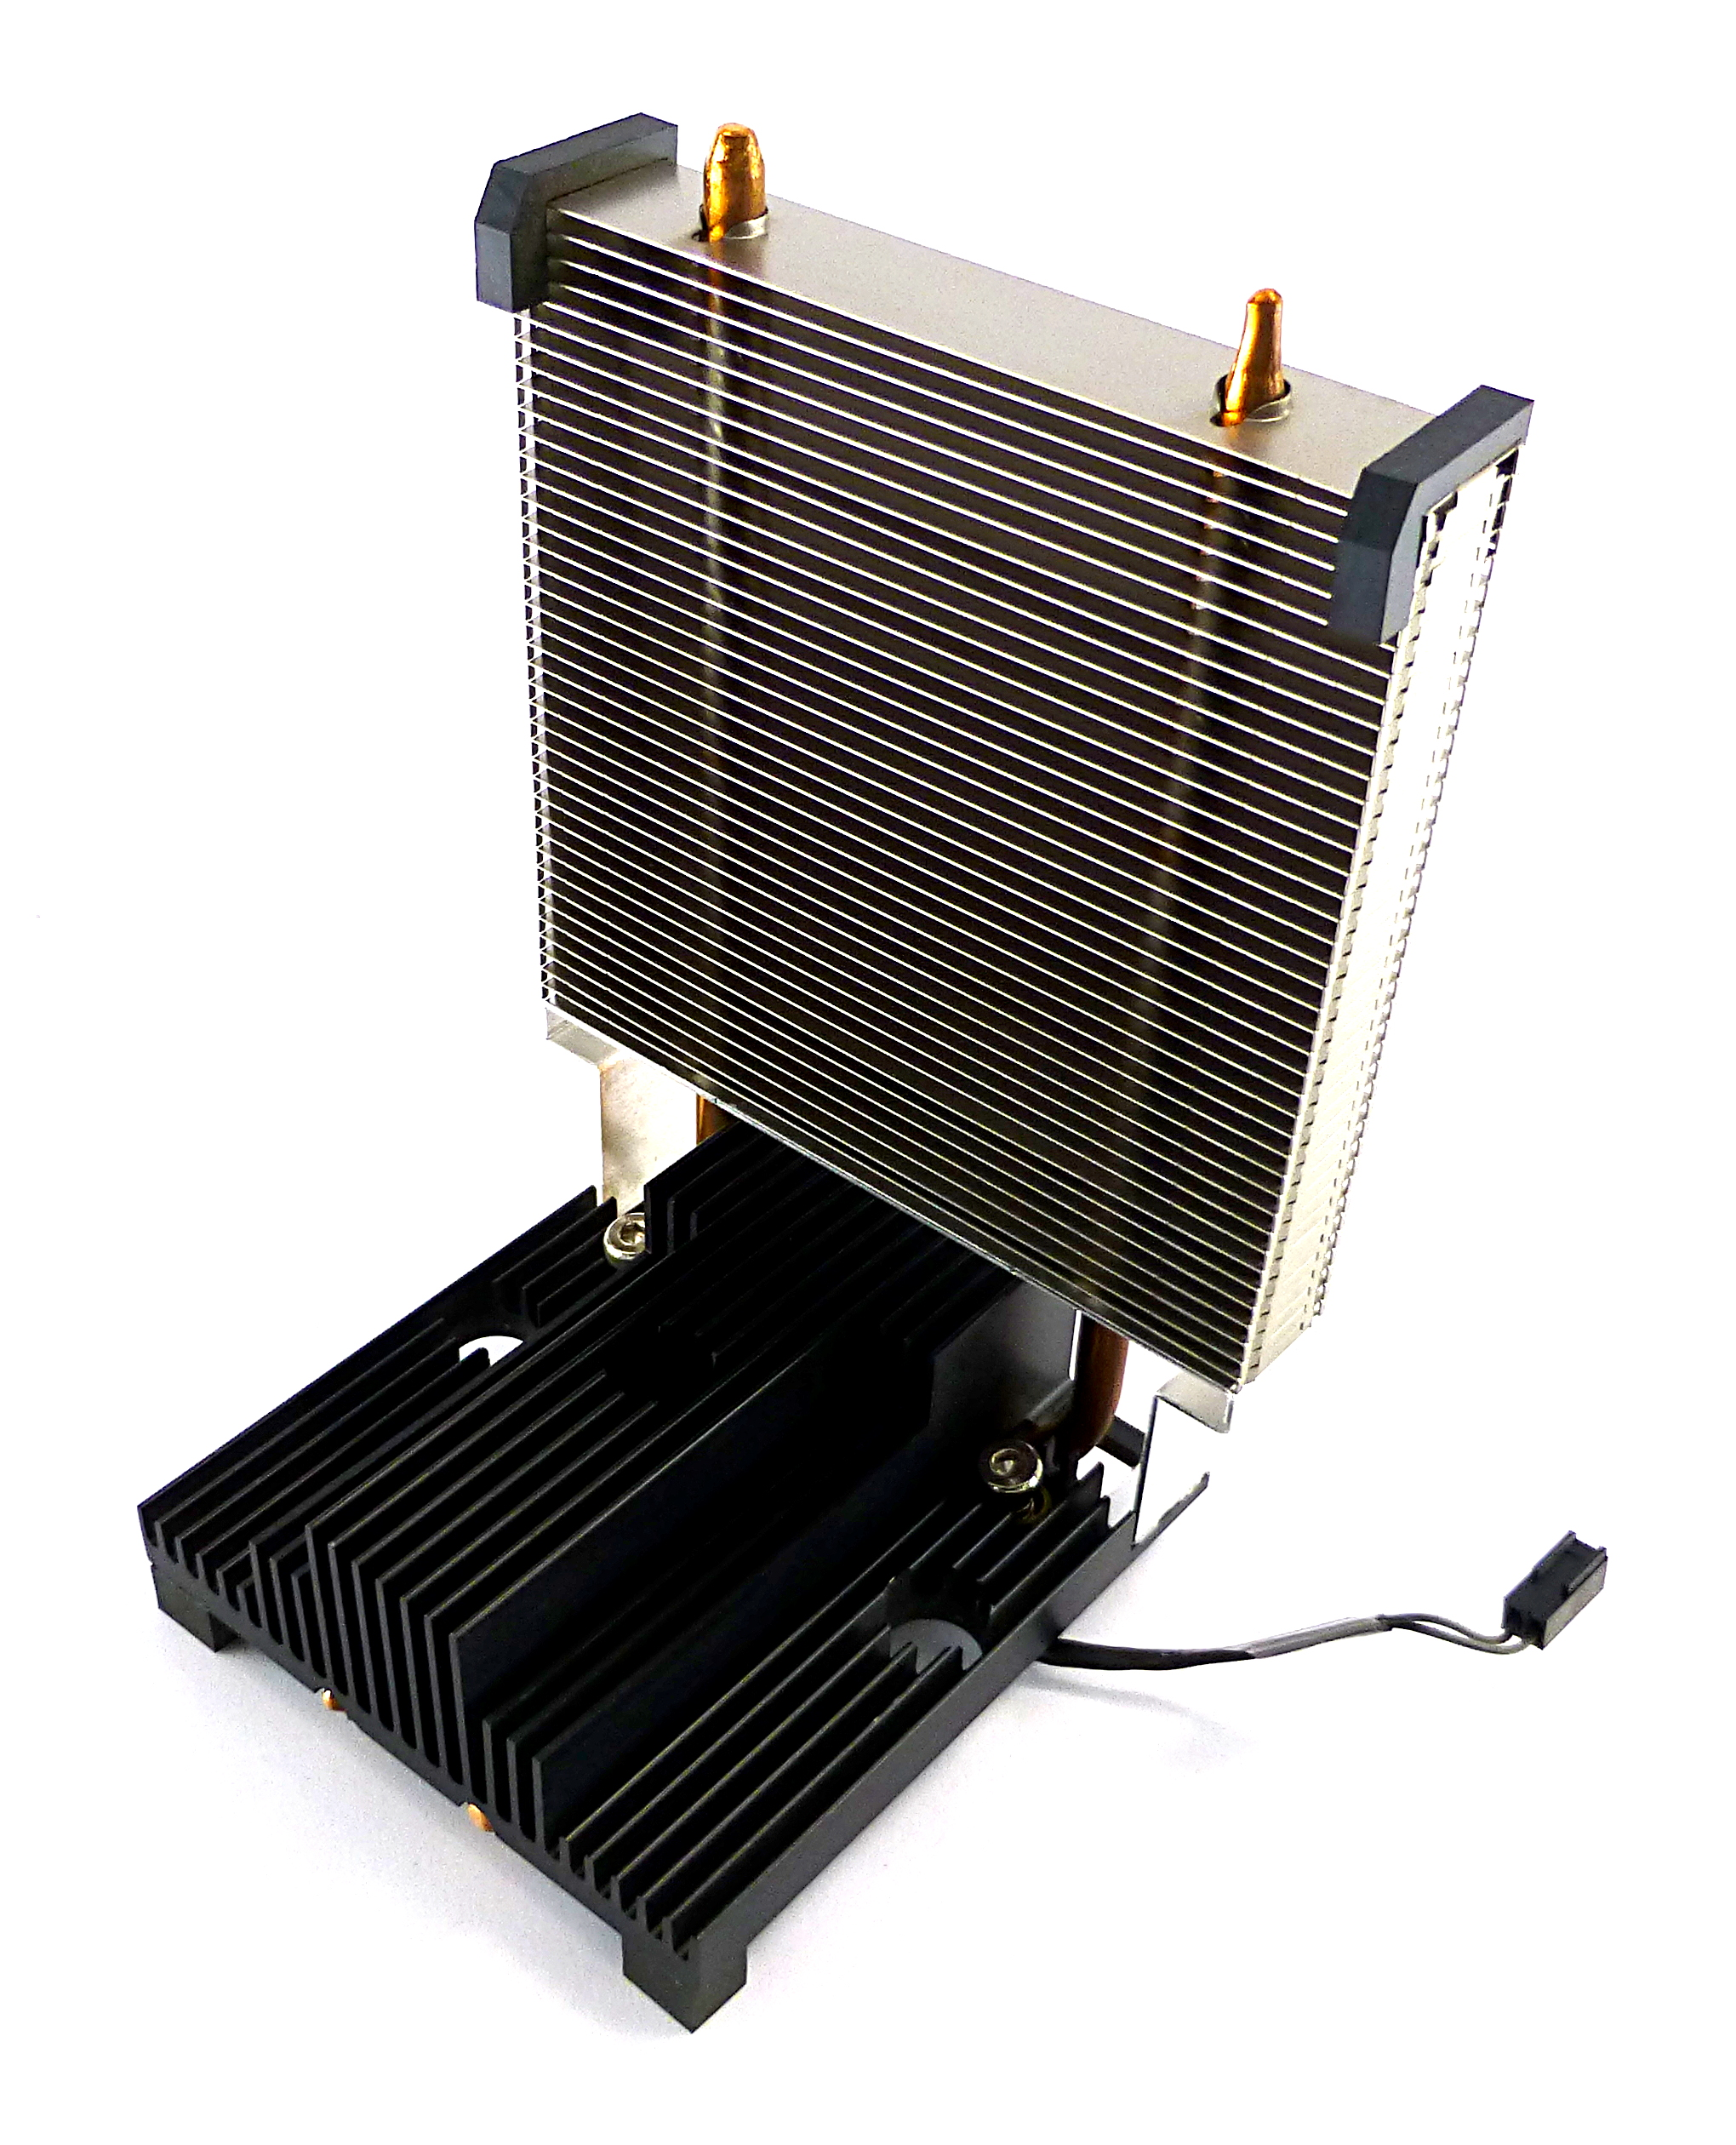 593-0636A Apple Mac Pro North Bridge Heatsink For A1186 (Early 2008) - Foxconn